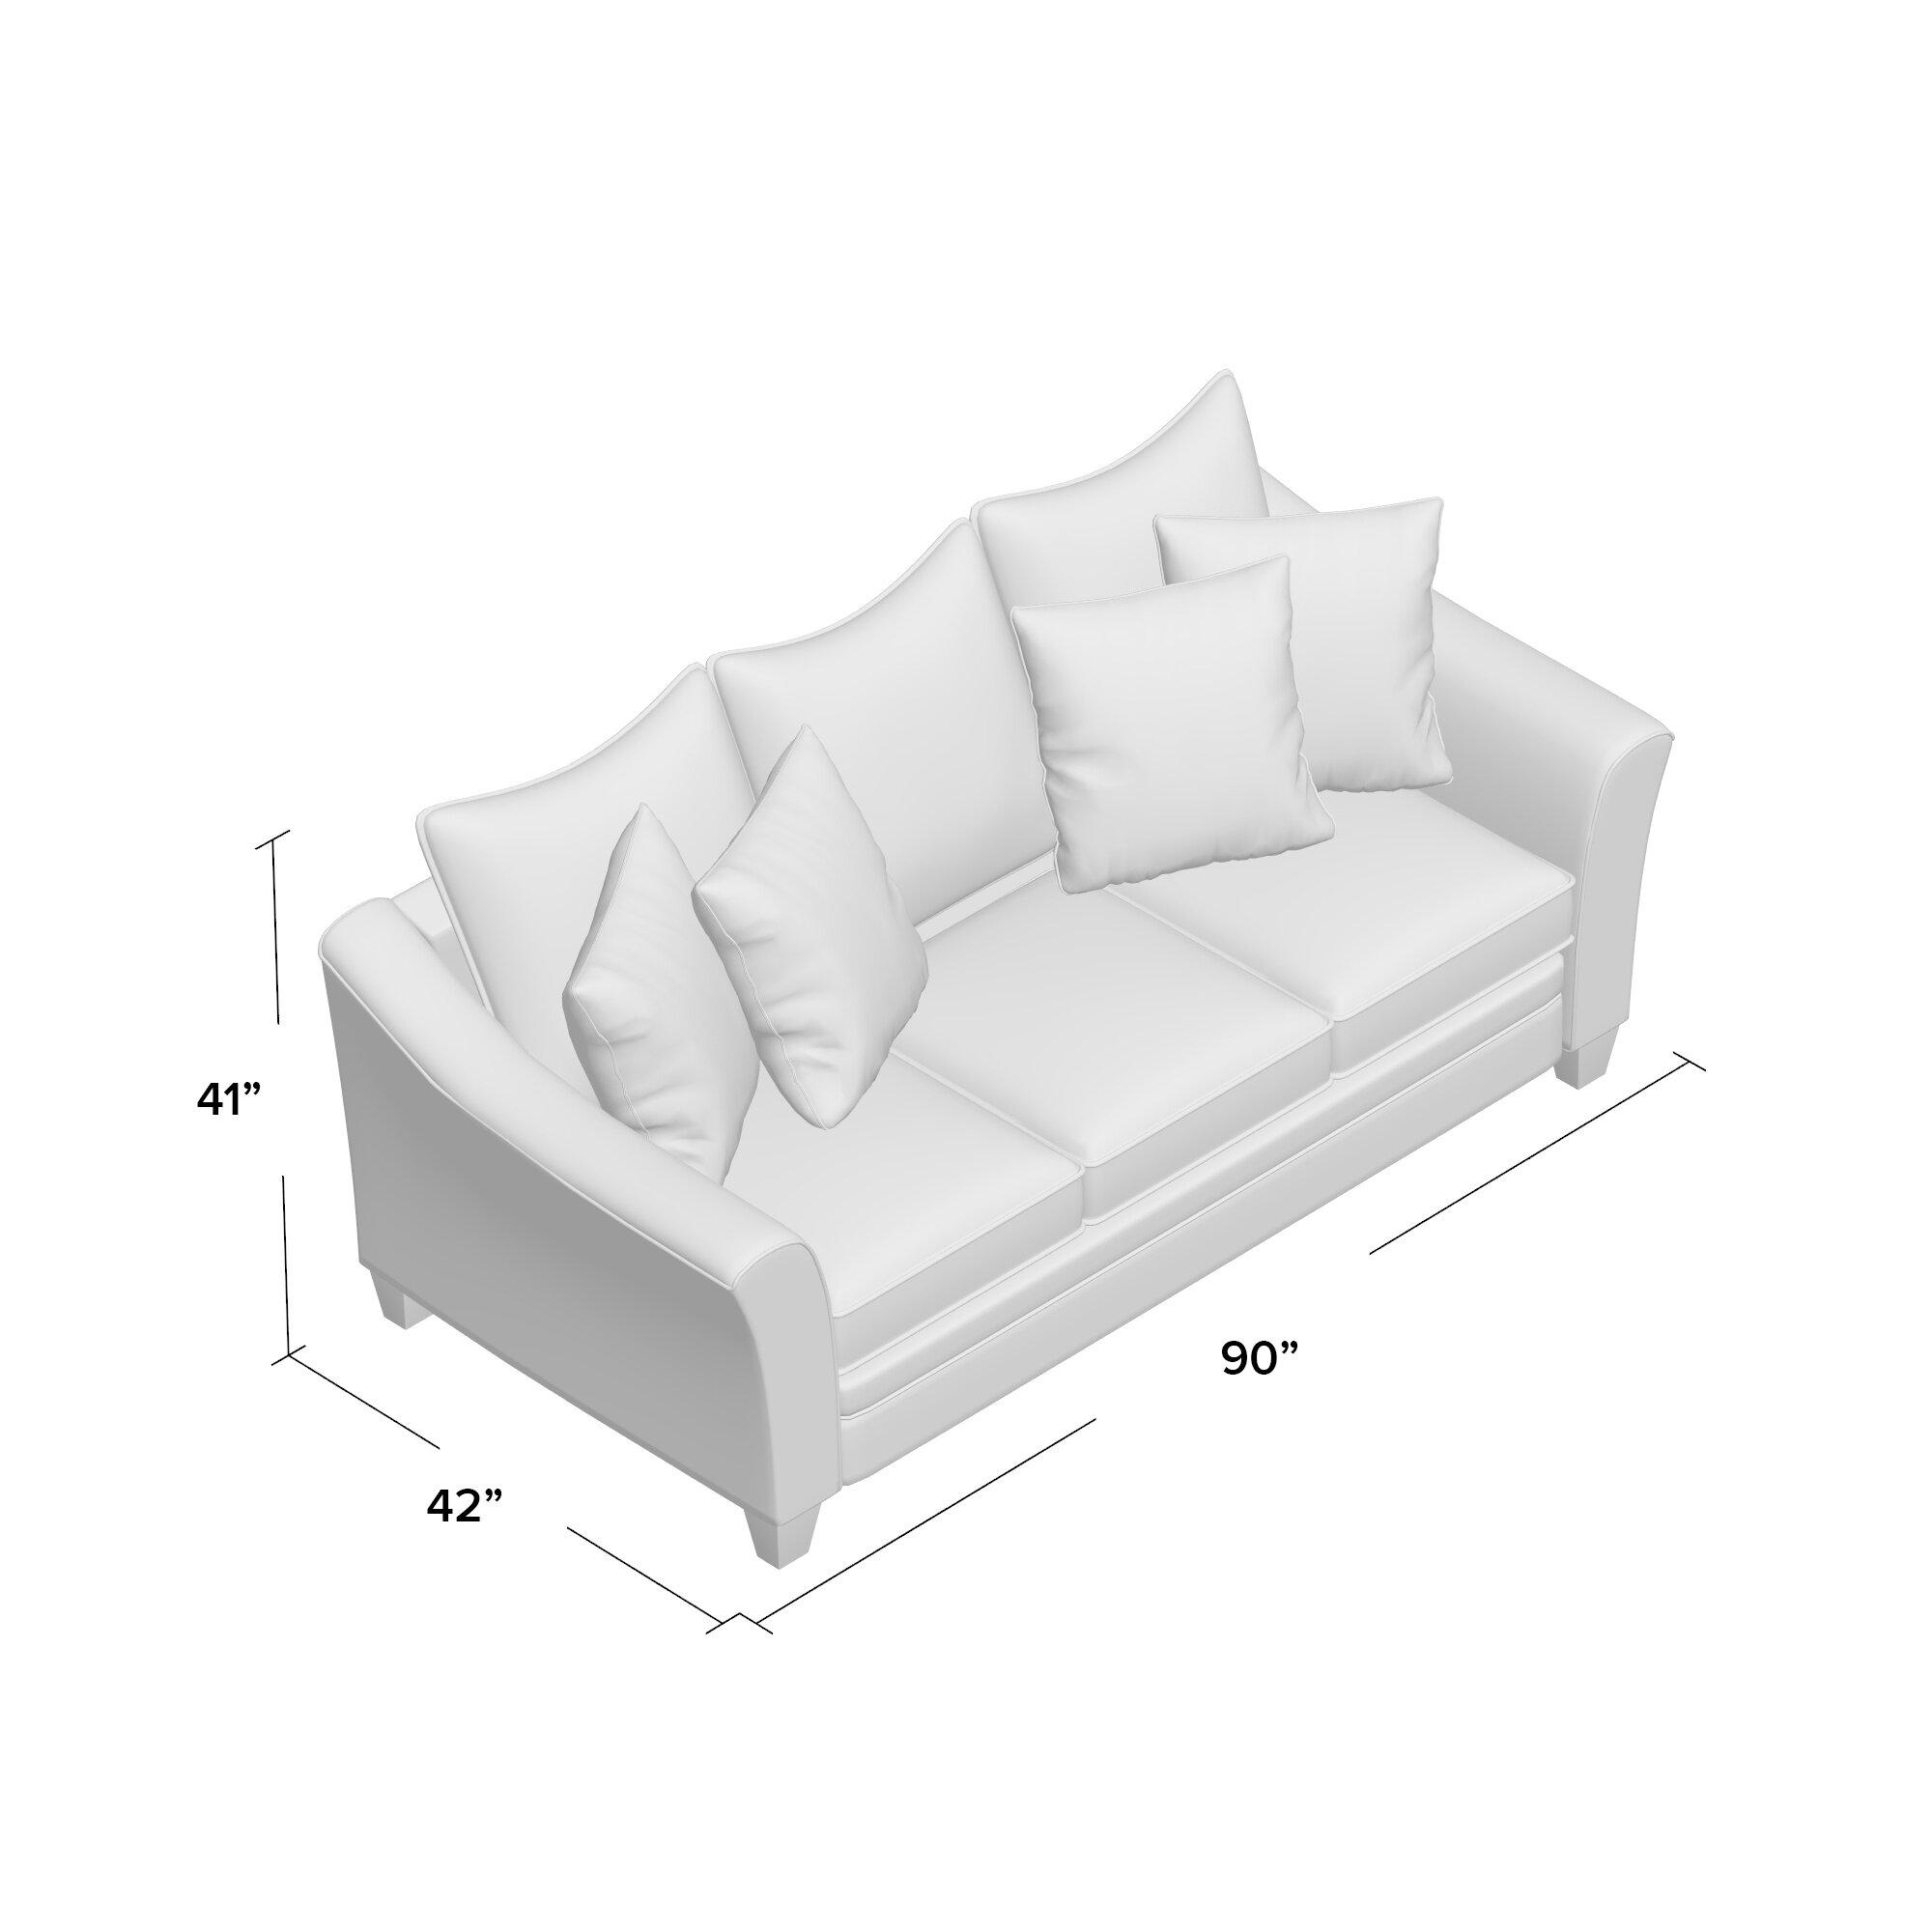 Latitude Run Simmons Upholstery Heath Sleeper Sofa Wayfair Supply .